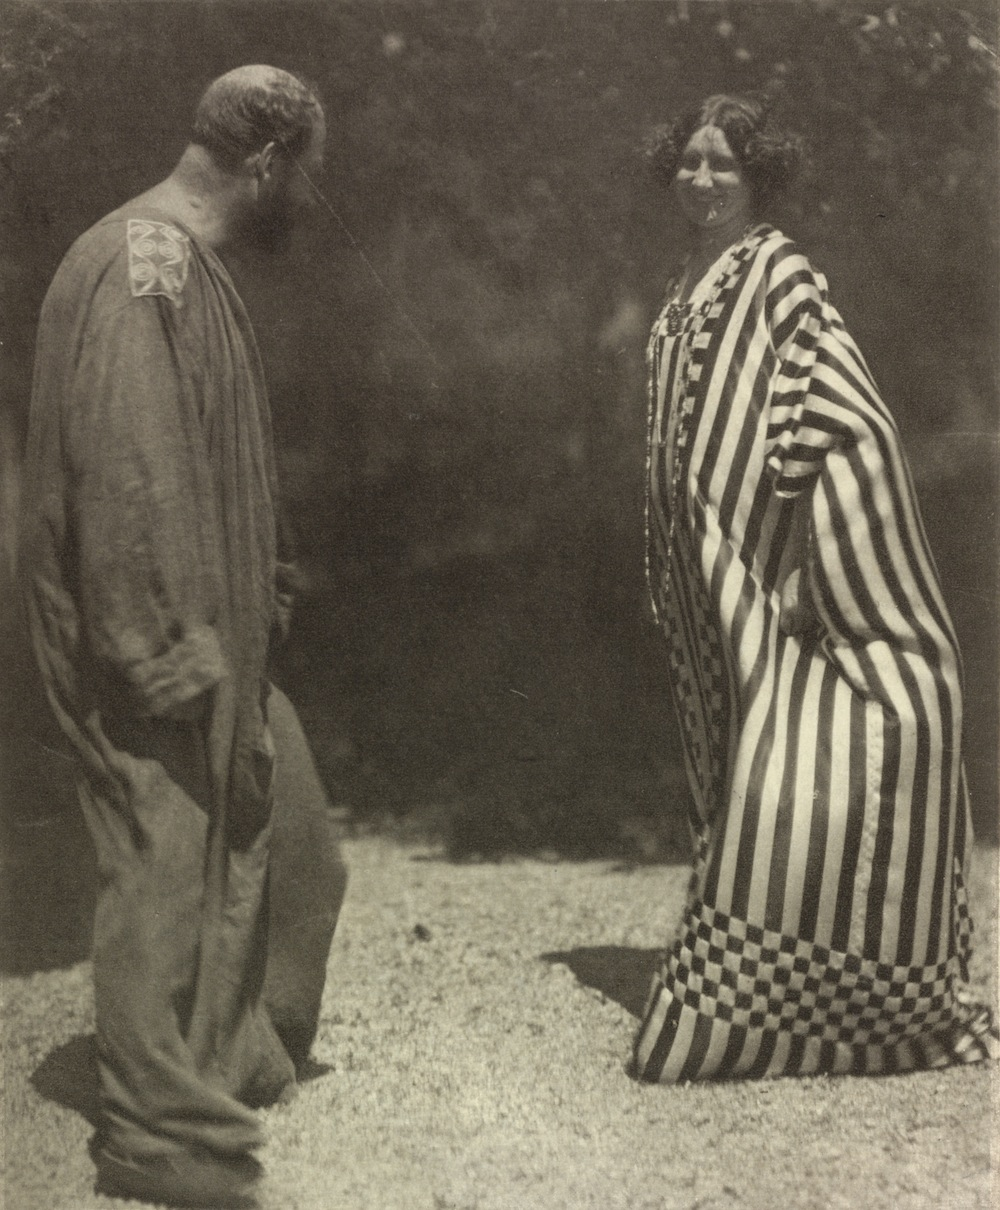 Emilie Flöge y Gustav Klimt